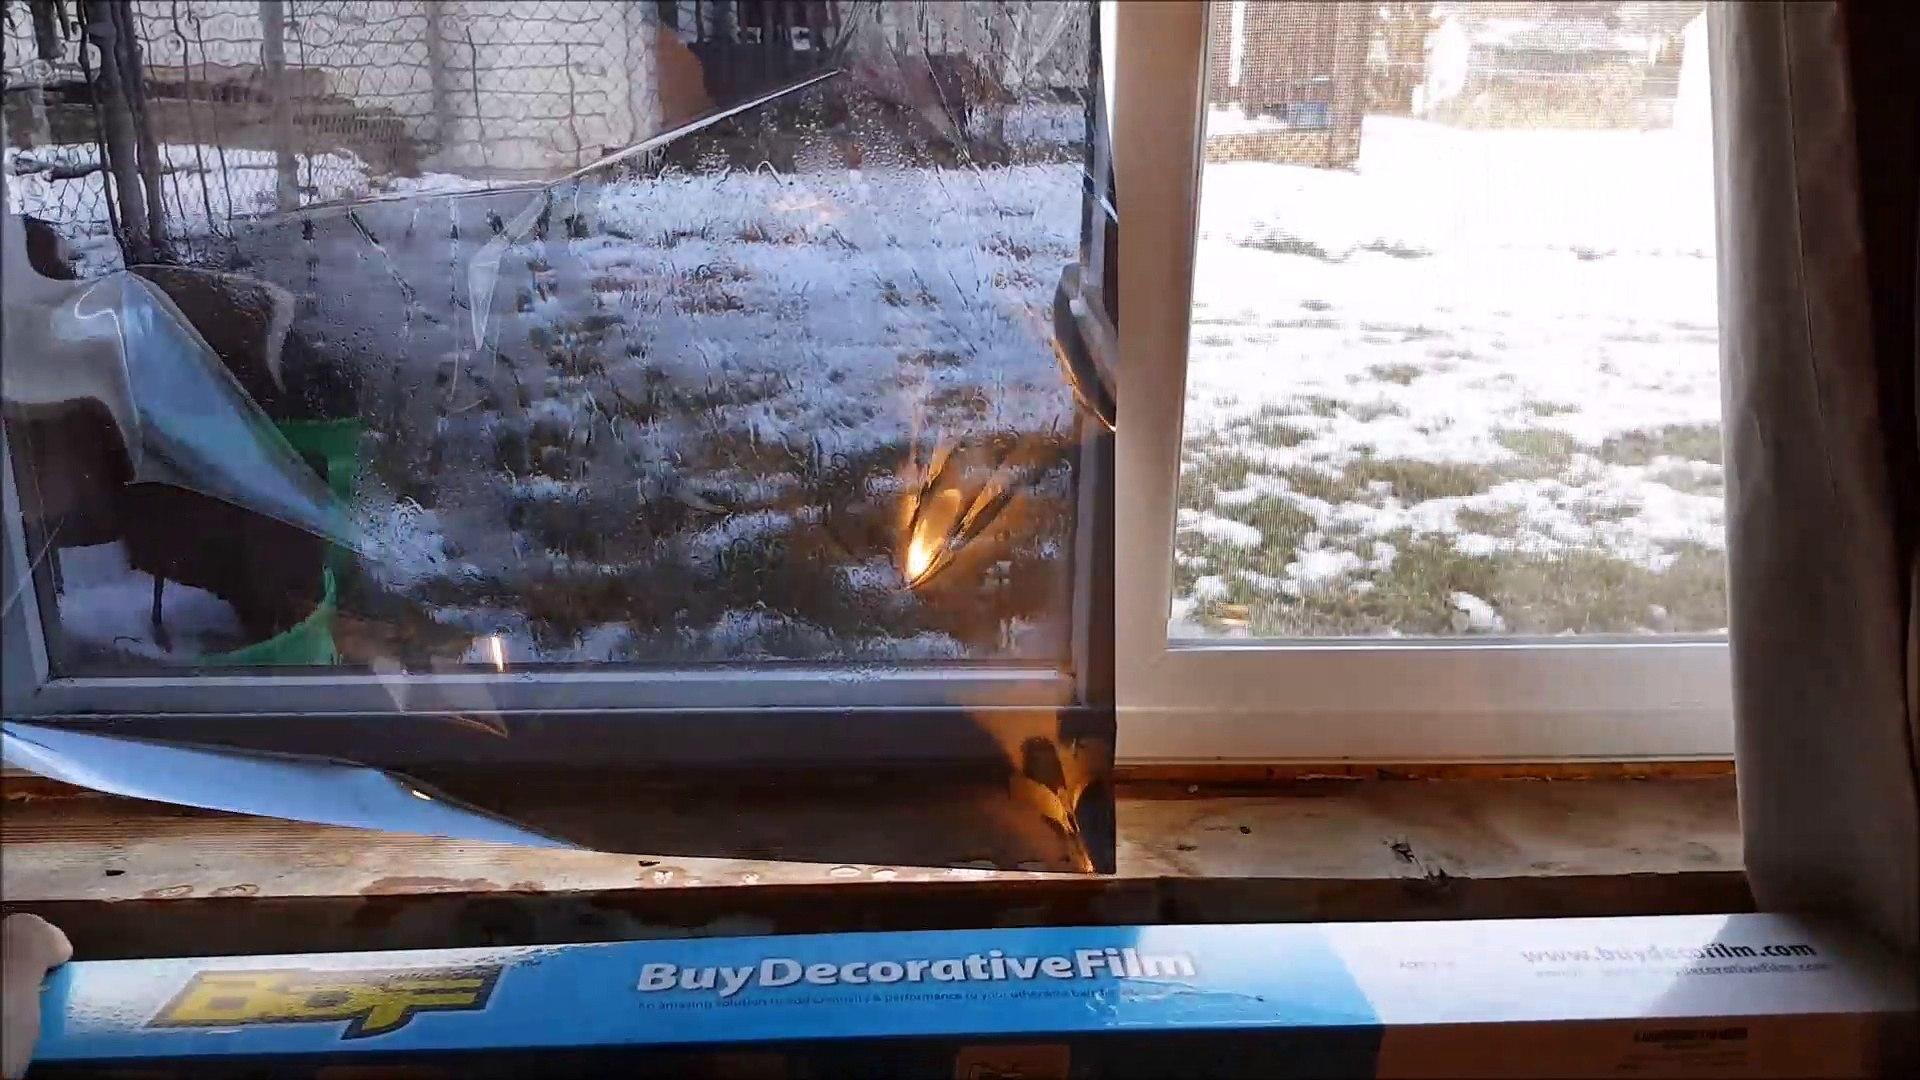 Solar Control /& Privacy Tint - One Way Mirror // Mirrored Glass 76cm x 3 Metre by Window Film ++ Silver Reflective Window Film